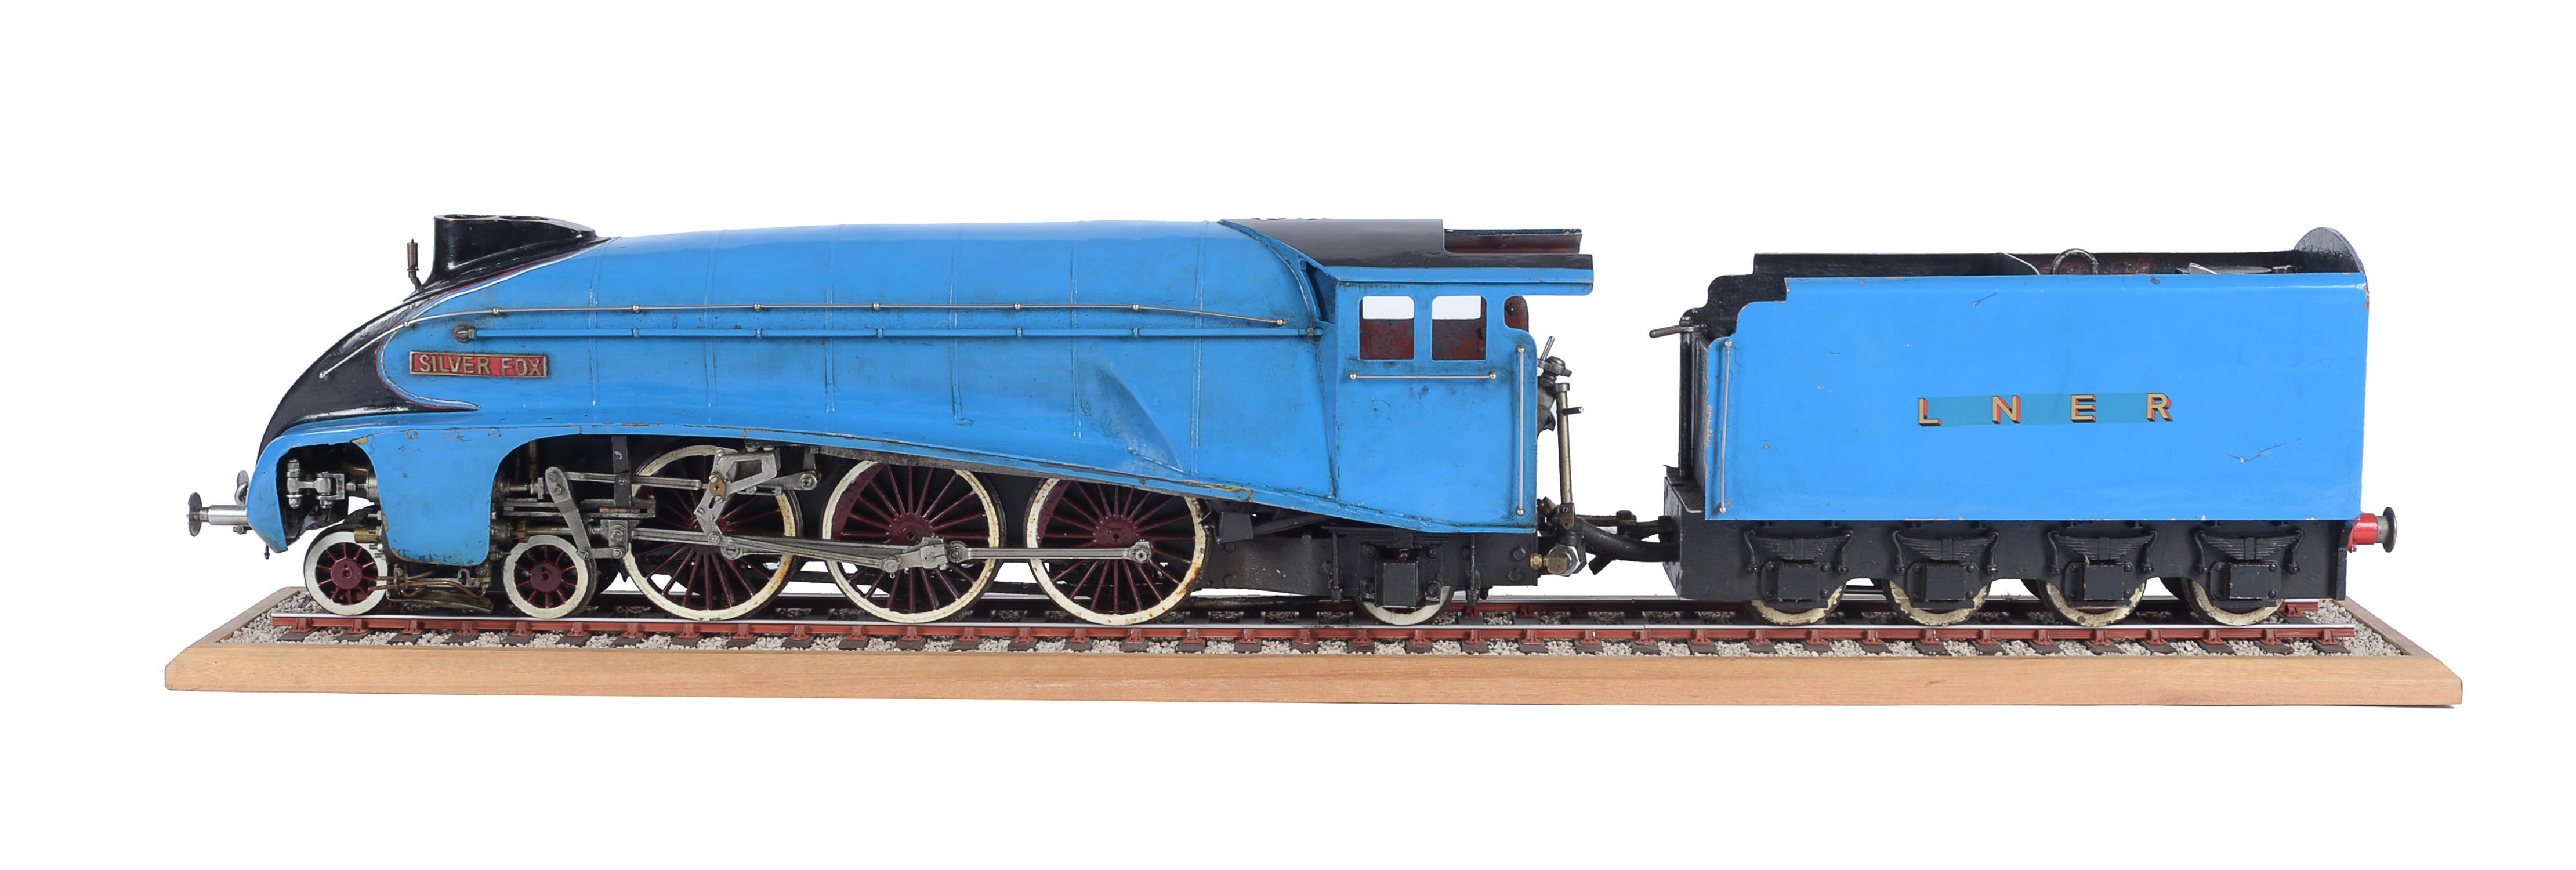 Lot 32 - A rare restoration project model of a 3 1/2 inch gauge A4 LNER 4-6-2 tender locomotive 'Silver Fox'